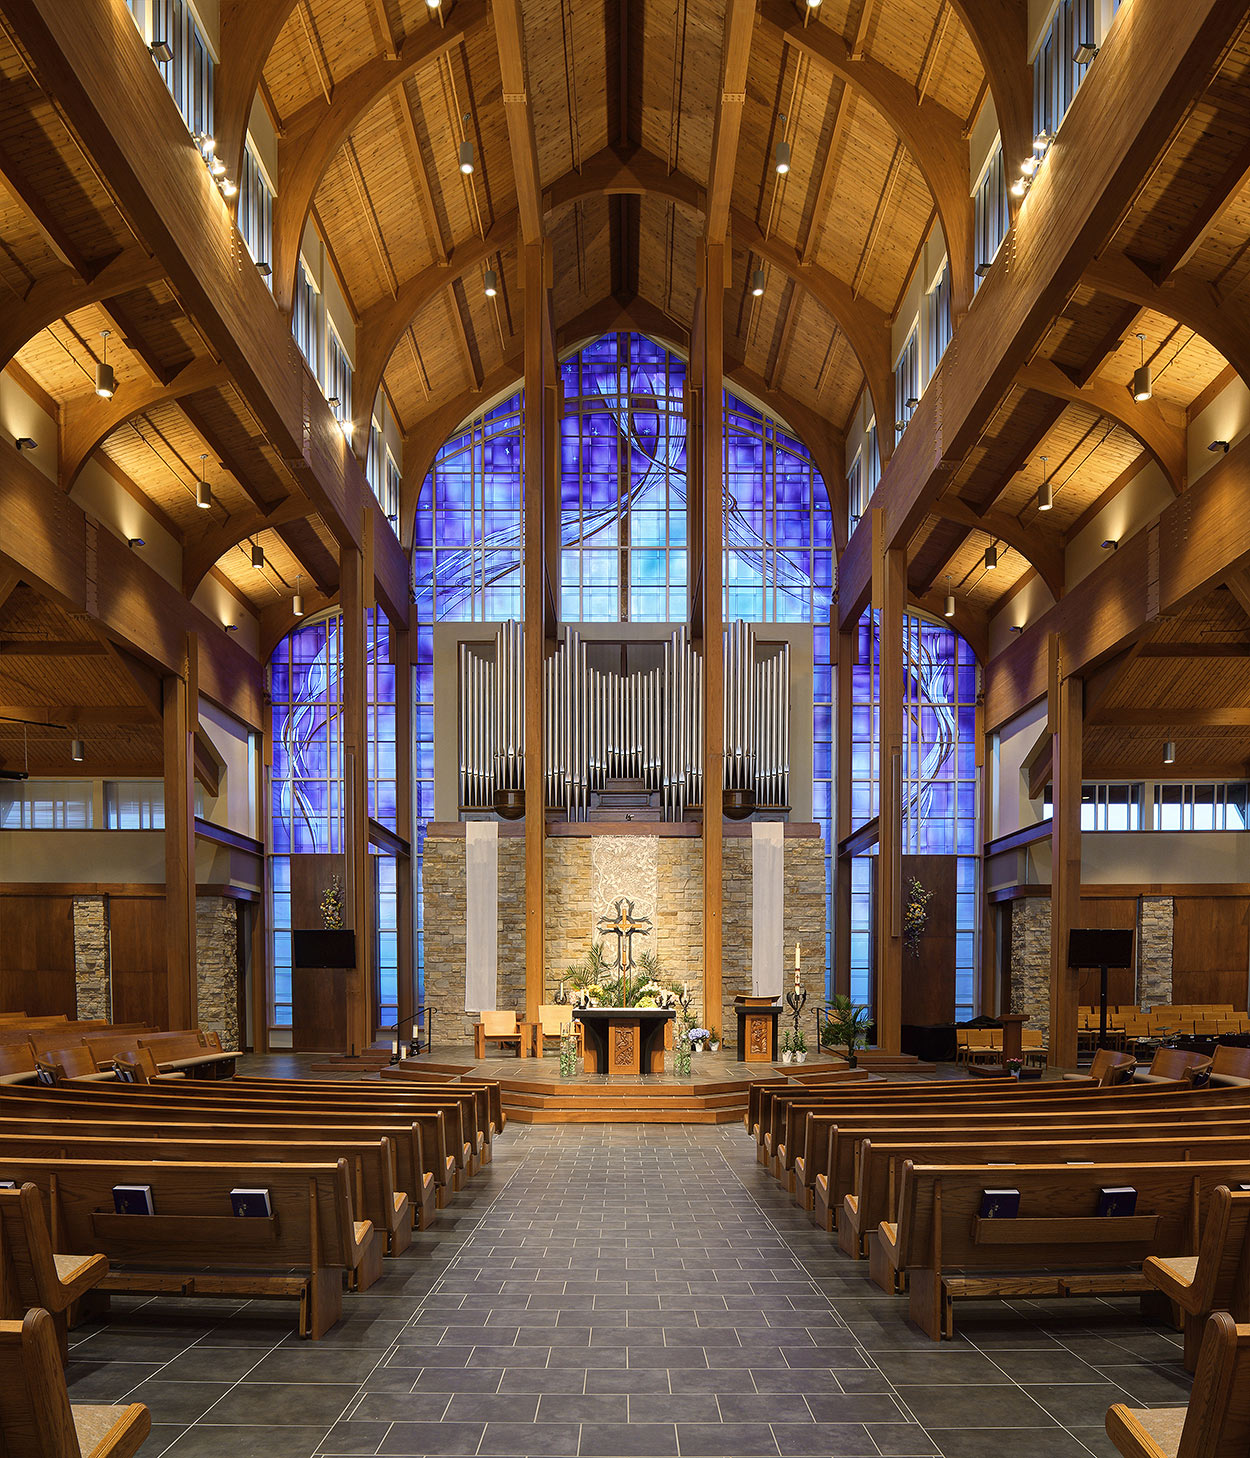 Church interior photographer